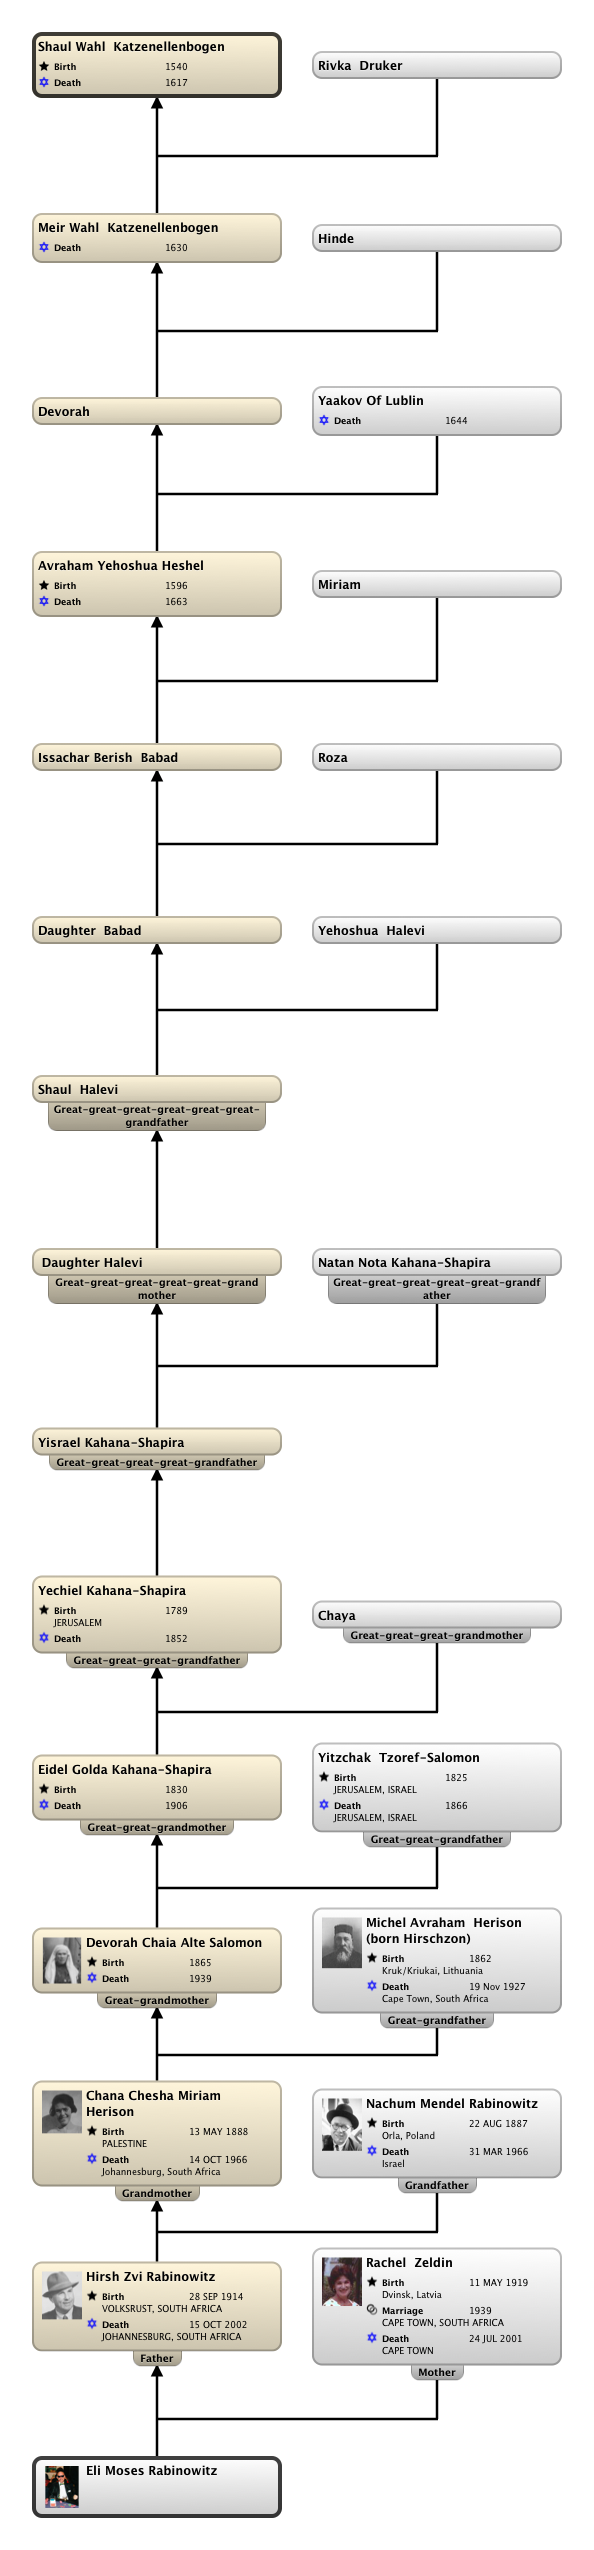 Relationship Chart Eli Moses Rabinowitz:Shaul Wahl  Katzenellenbogen